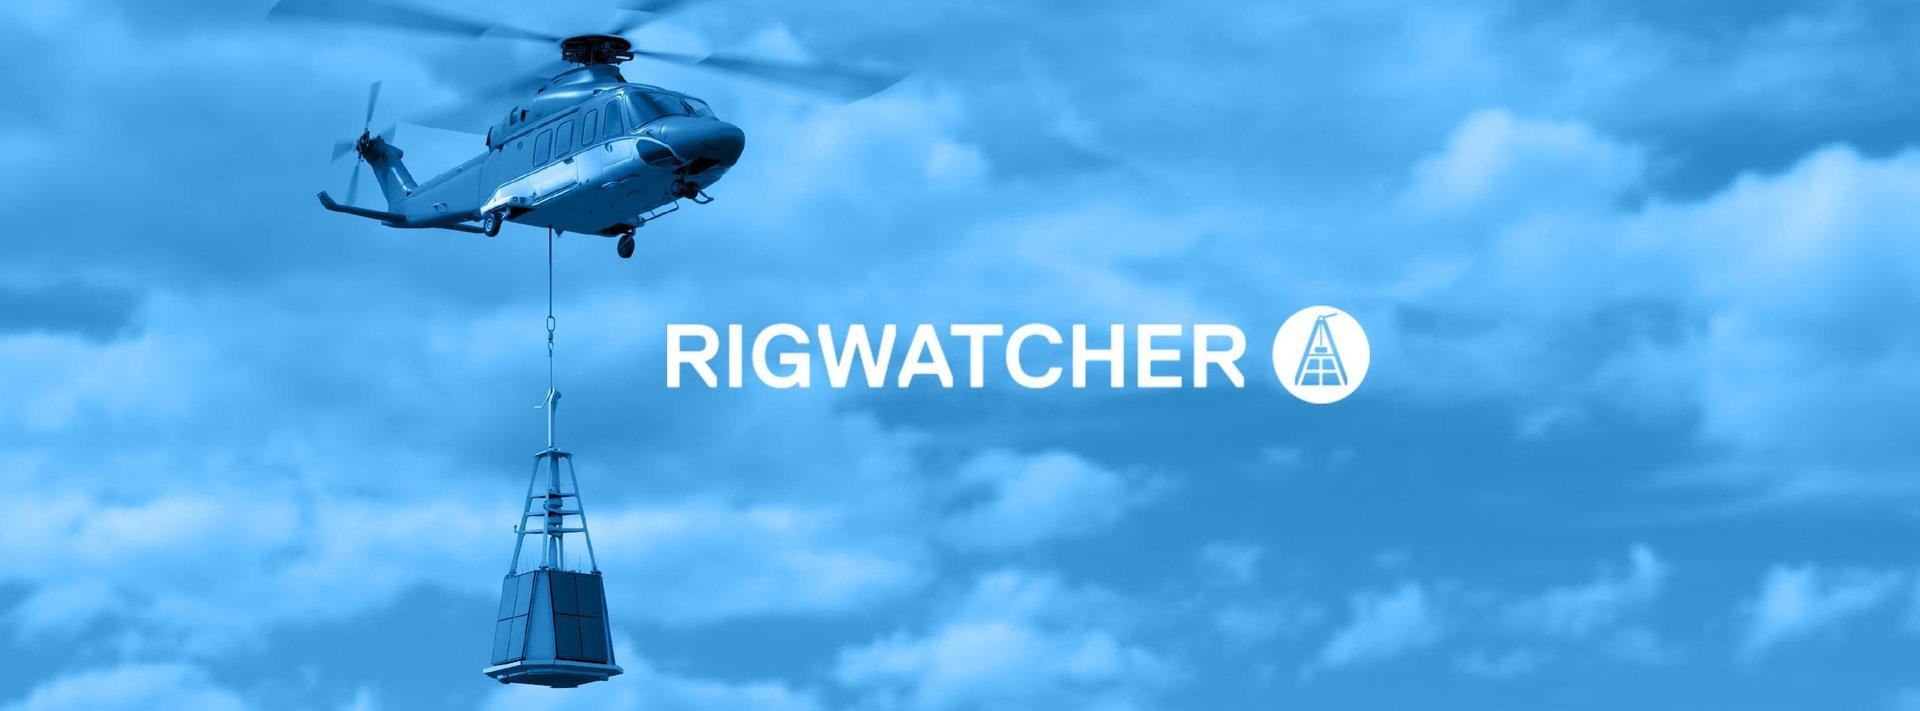 rigwatcher_blog-1